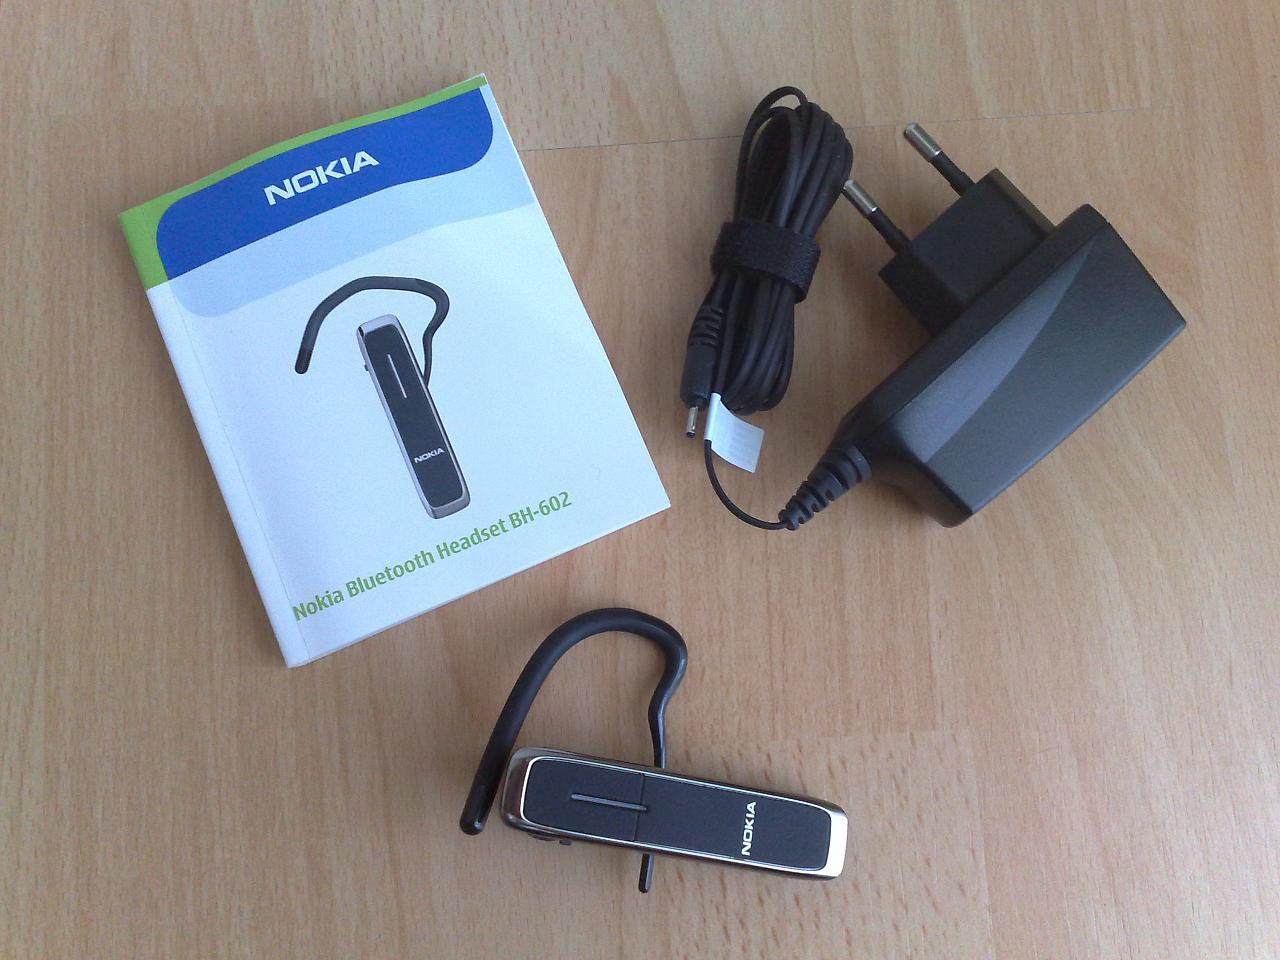 test nokia bluetooth headset bh 602 s60inside. Black Bedroom Furniture Sets. Home Design Ideas